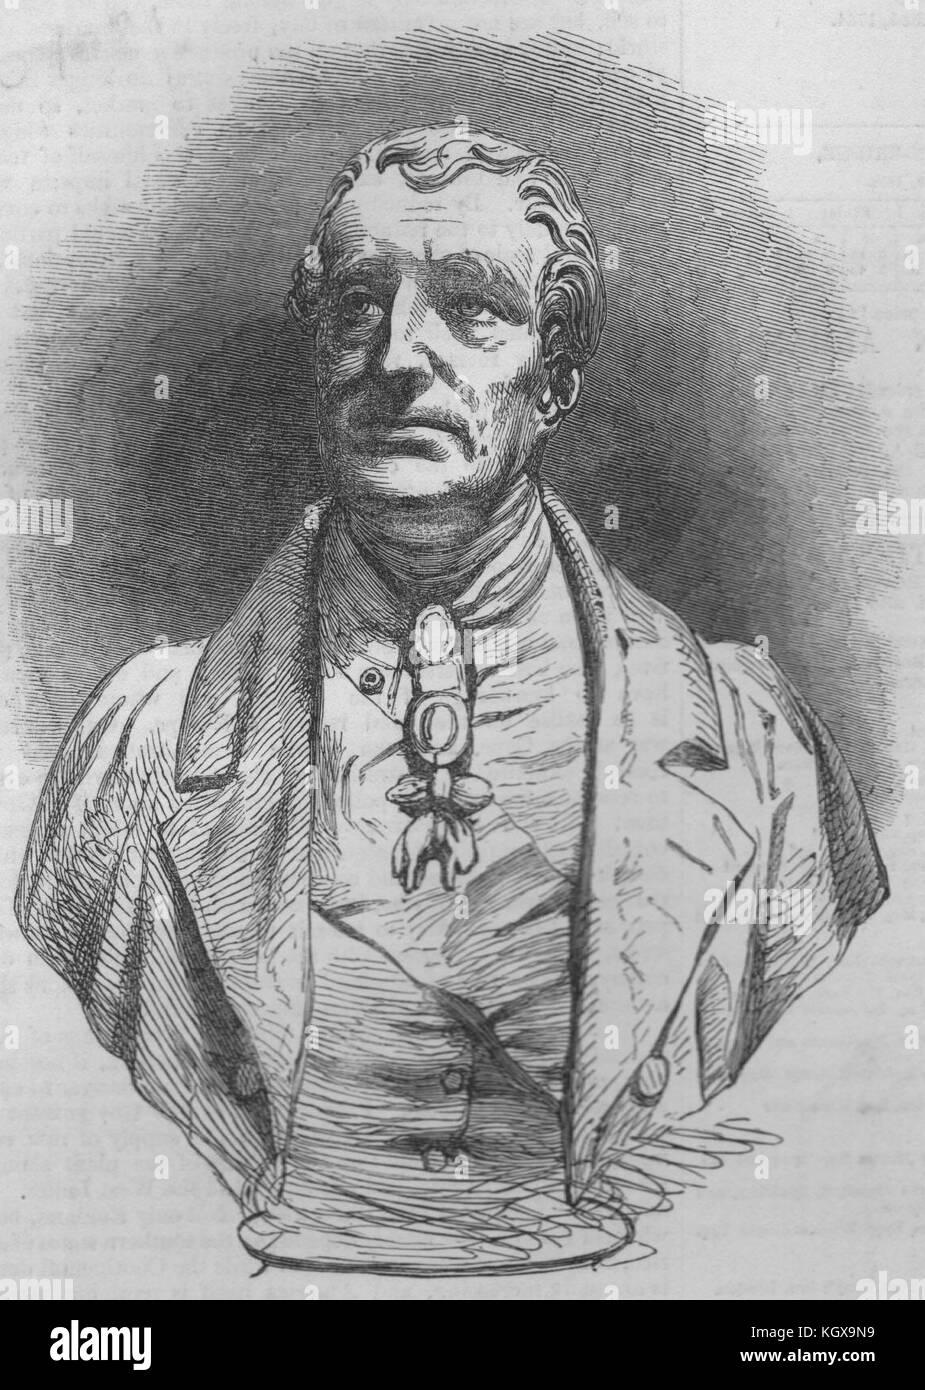 Reminiscences of 'The Duke'. Bust of the Duke Of Wellington. Portraits 1852. The Illustrated London News - Stock Image